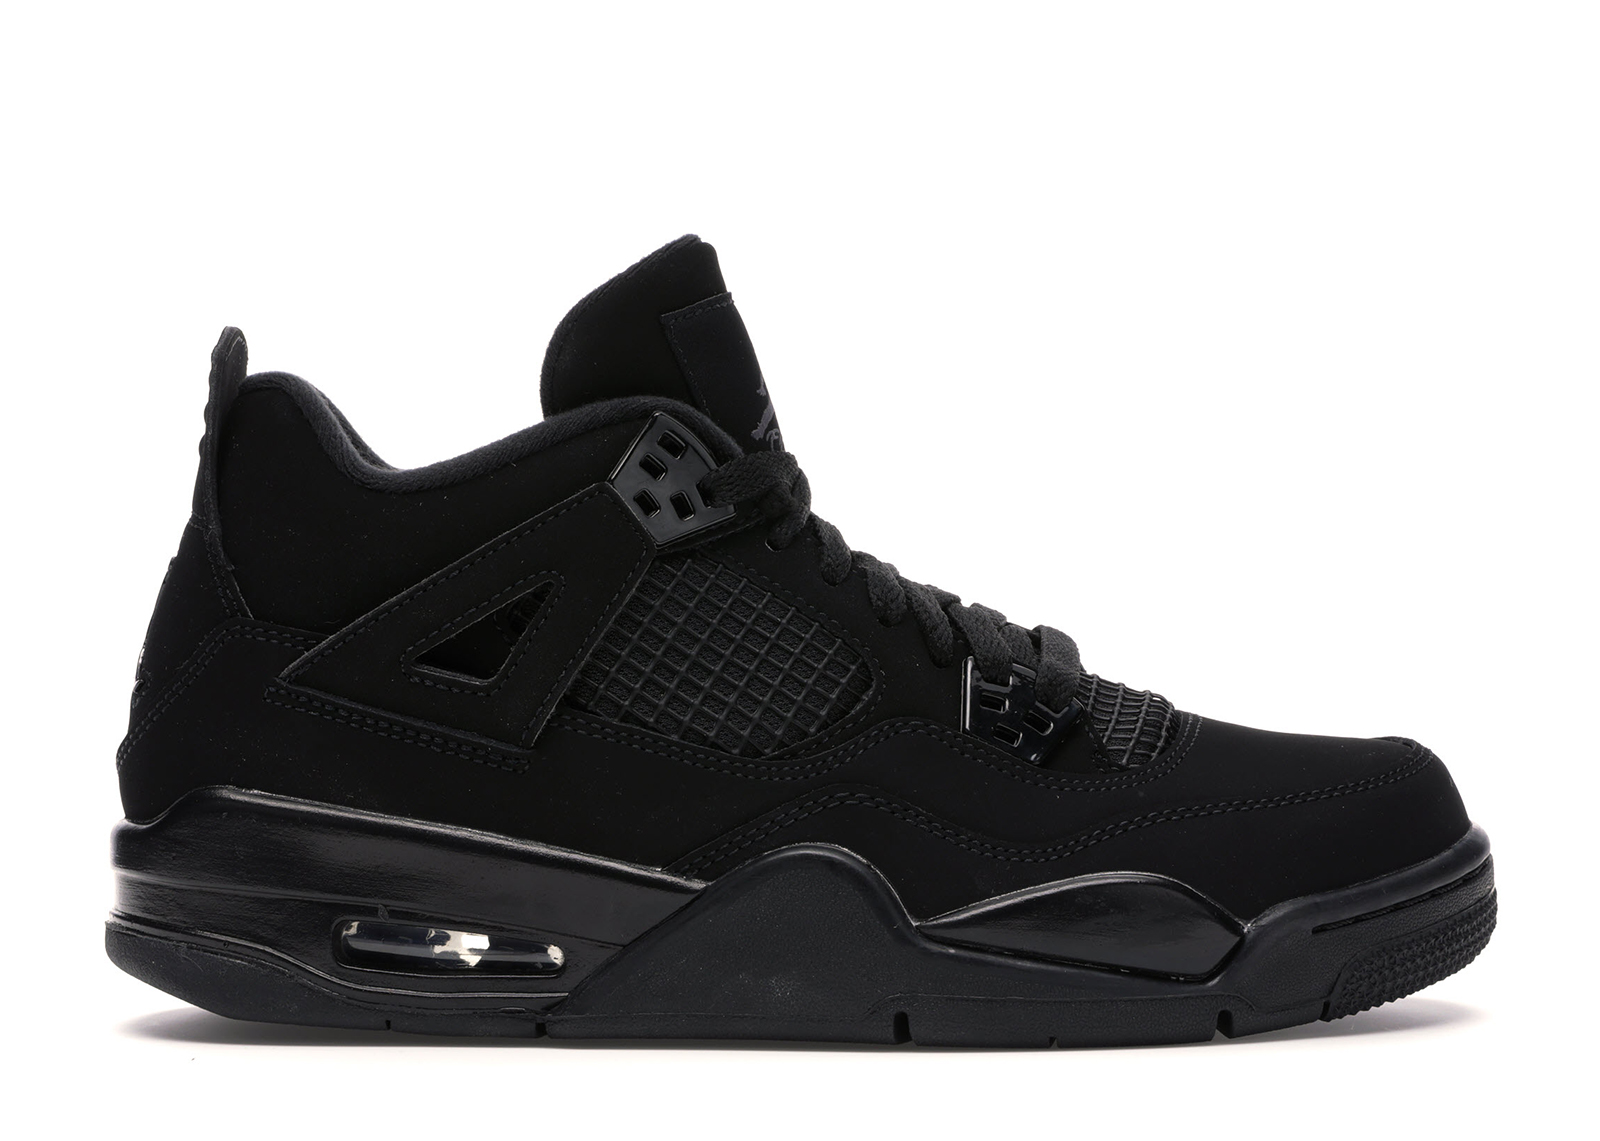 Jordan 4 Retro Black Cat 2020 (GS